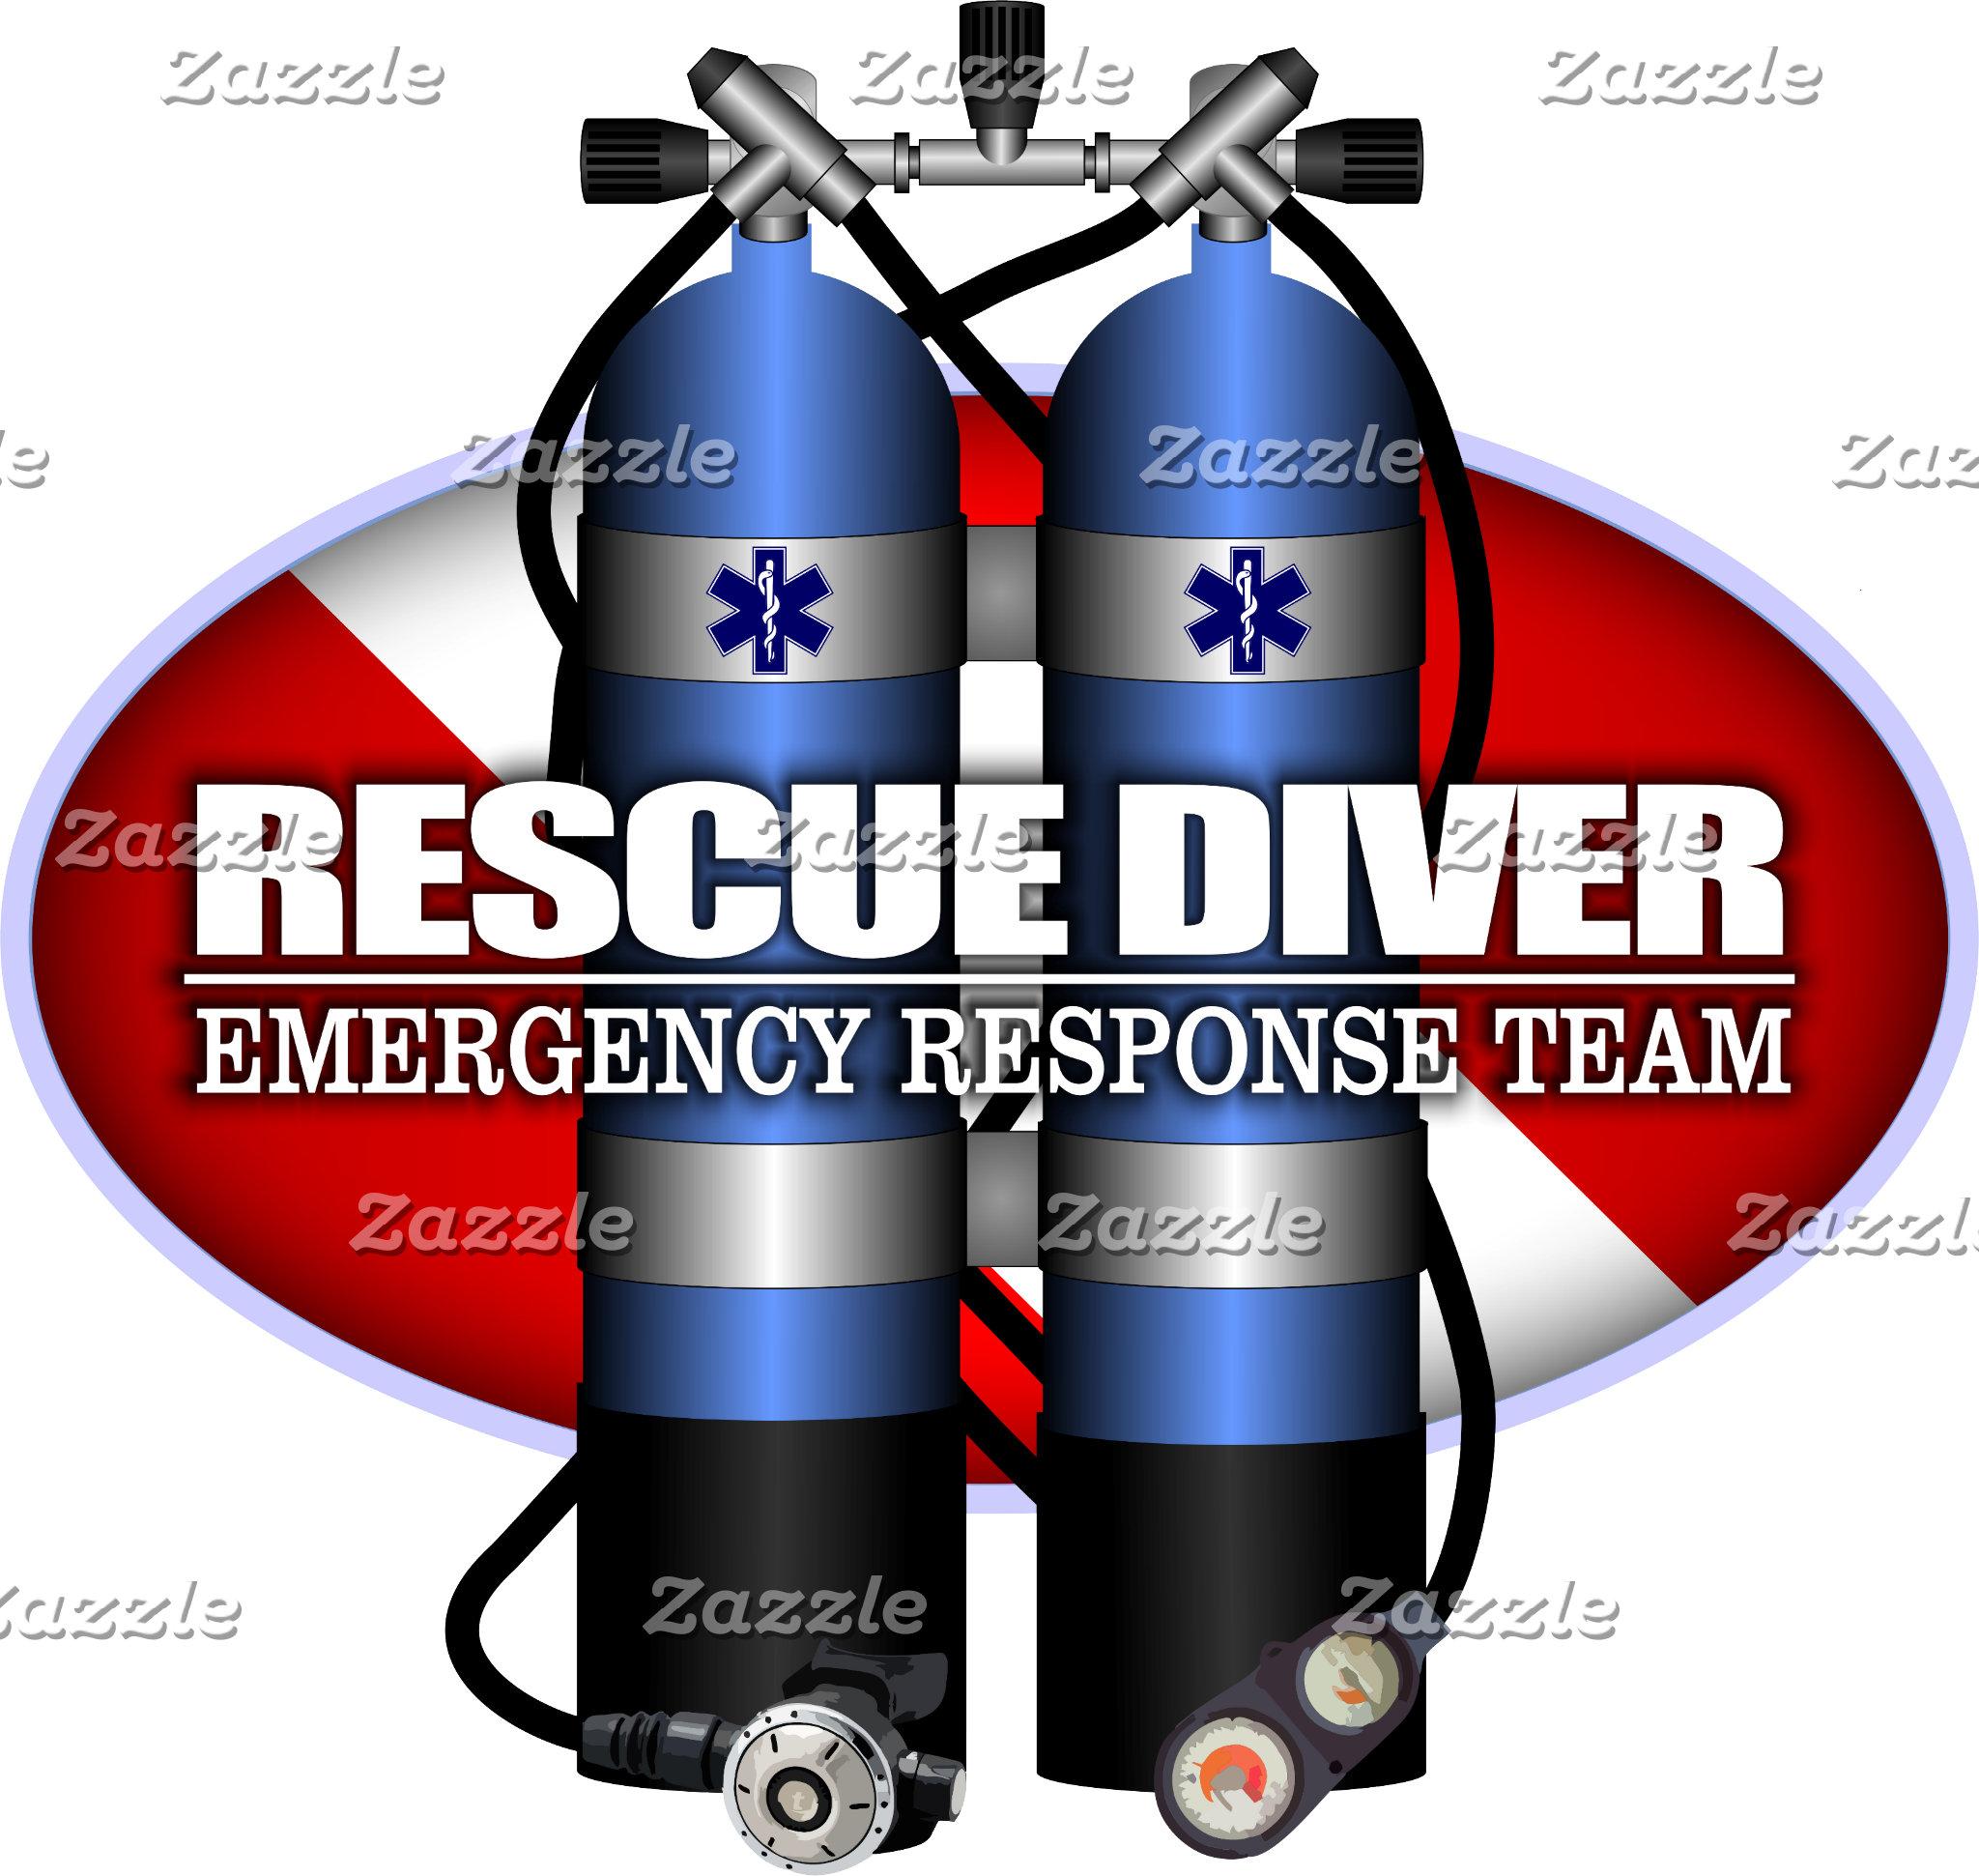 Rescue Diver (ST)